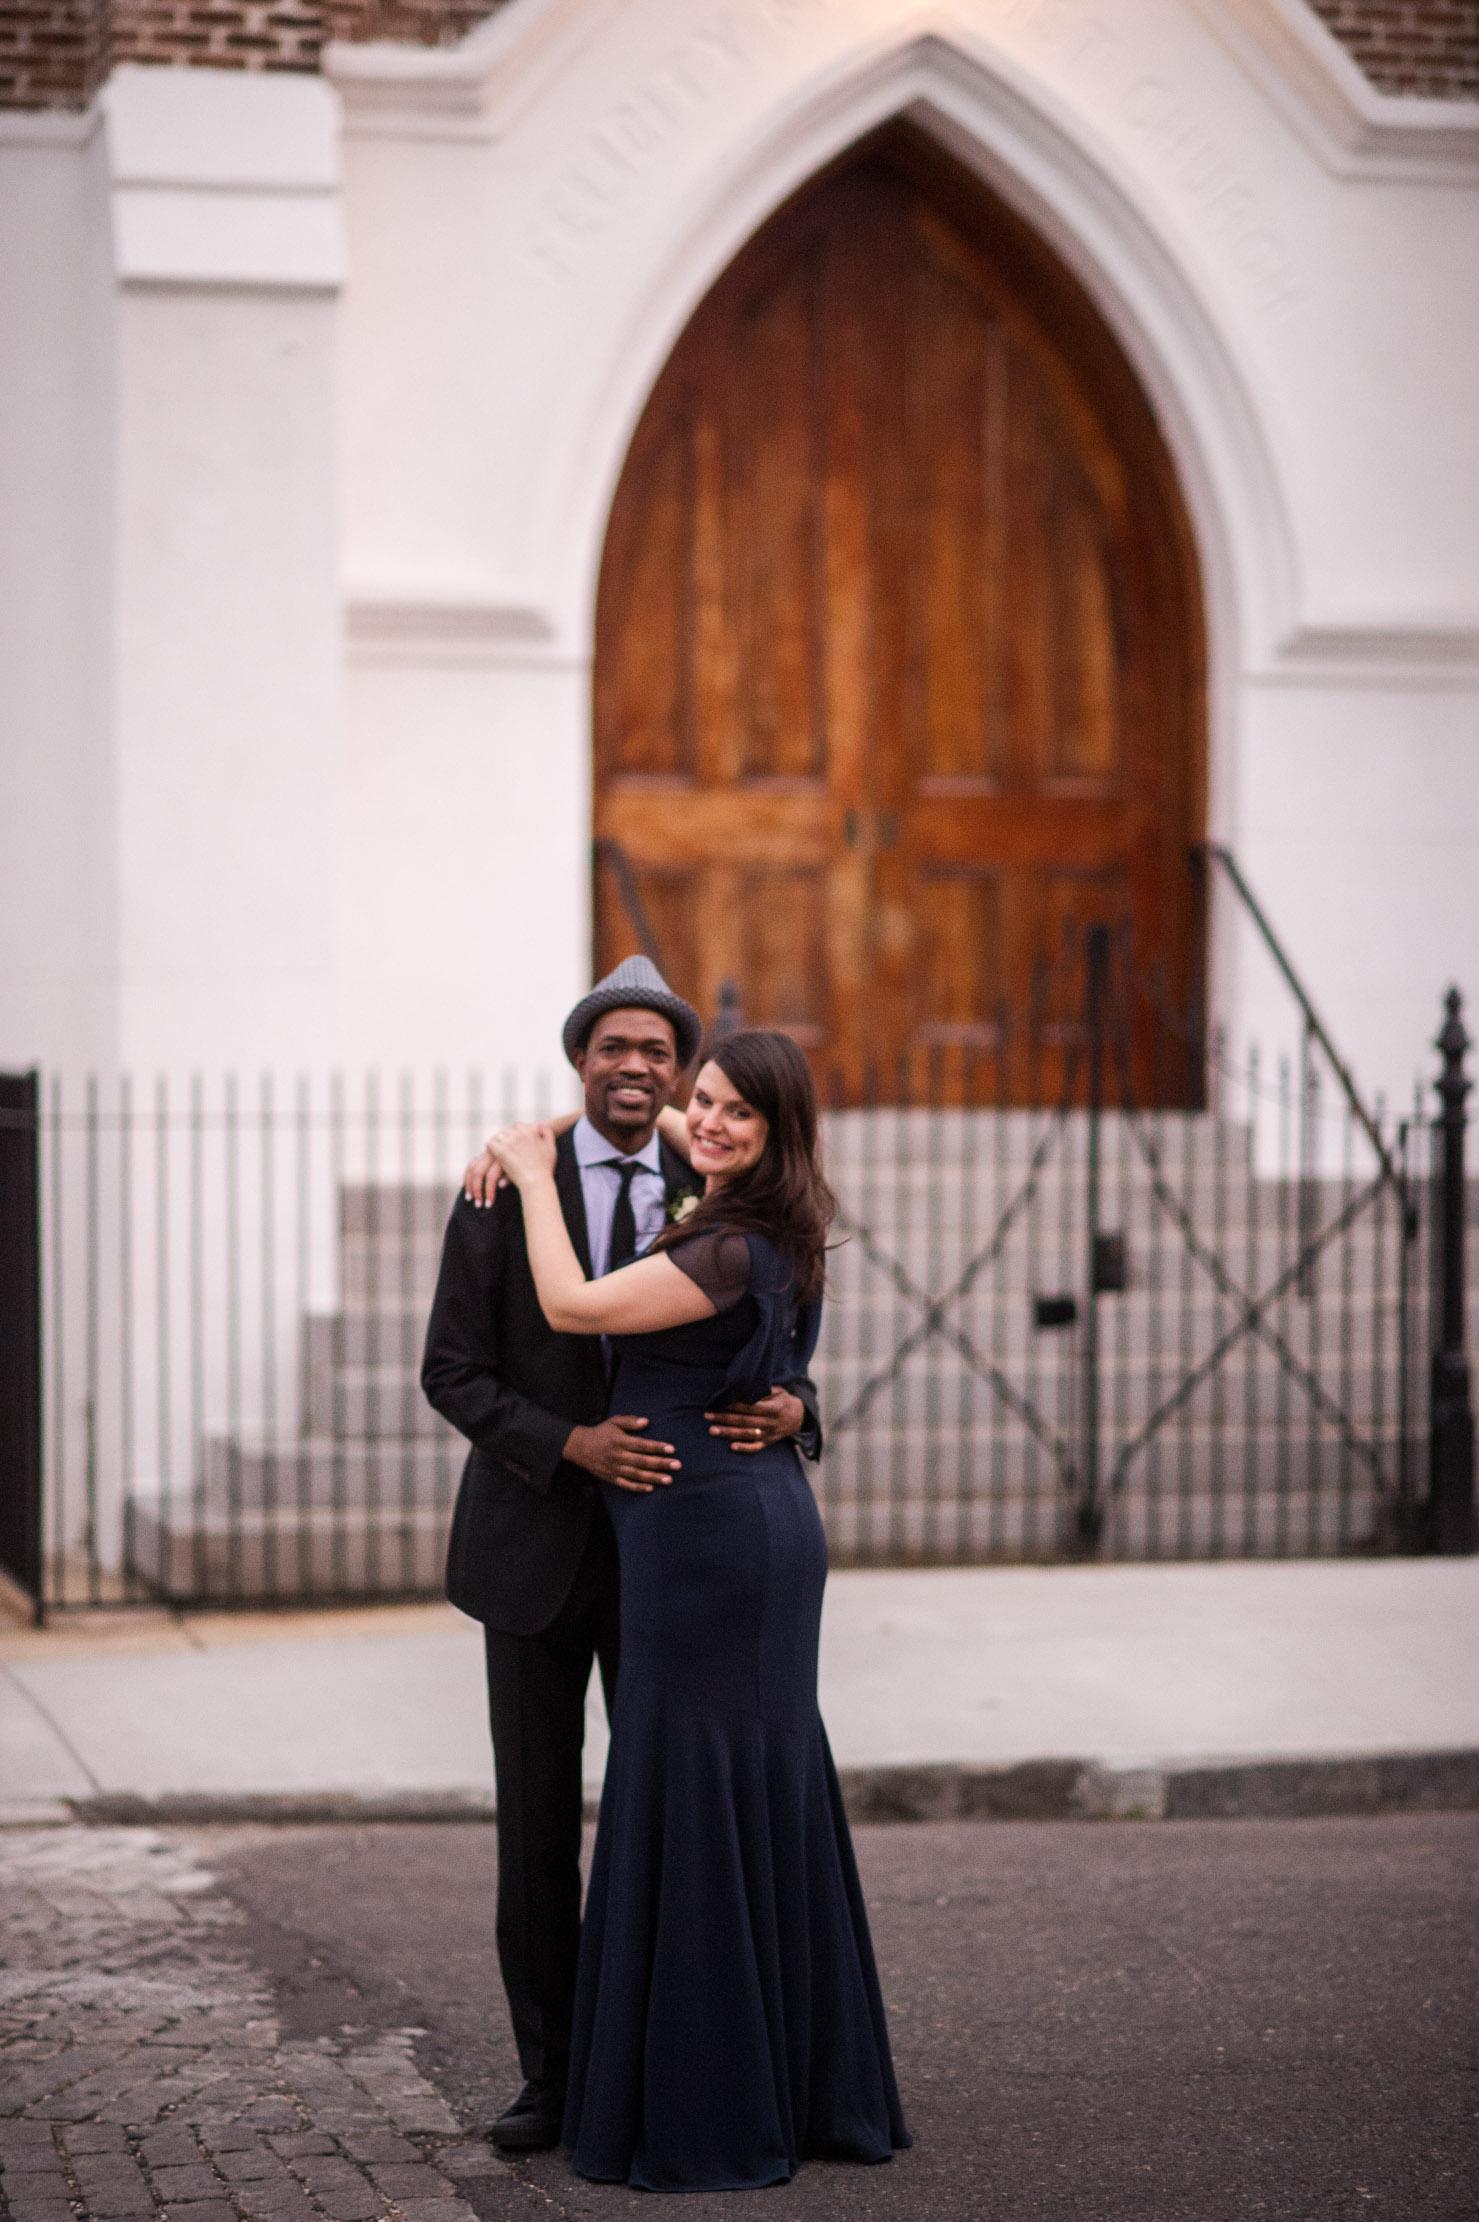 NOLA-Felicity-Church-Ace-Hotel-Wedding-1103.jpg